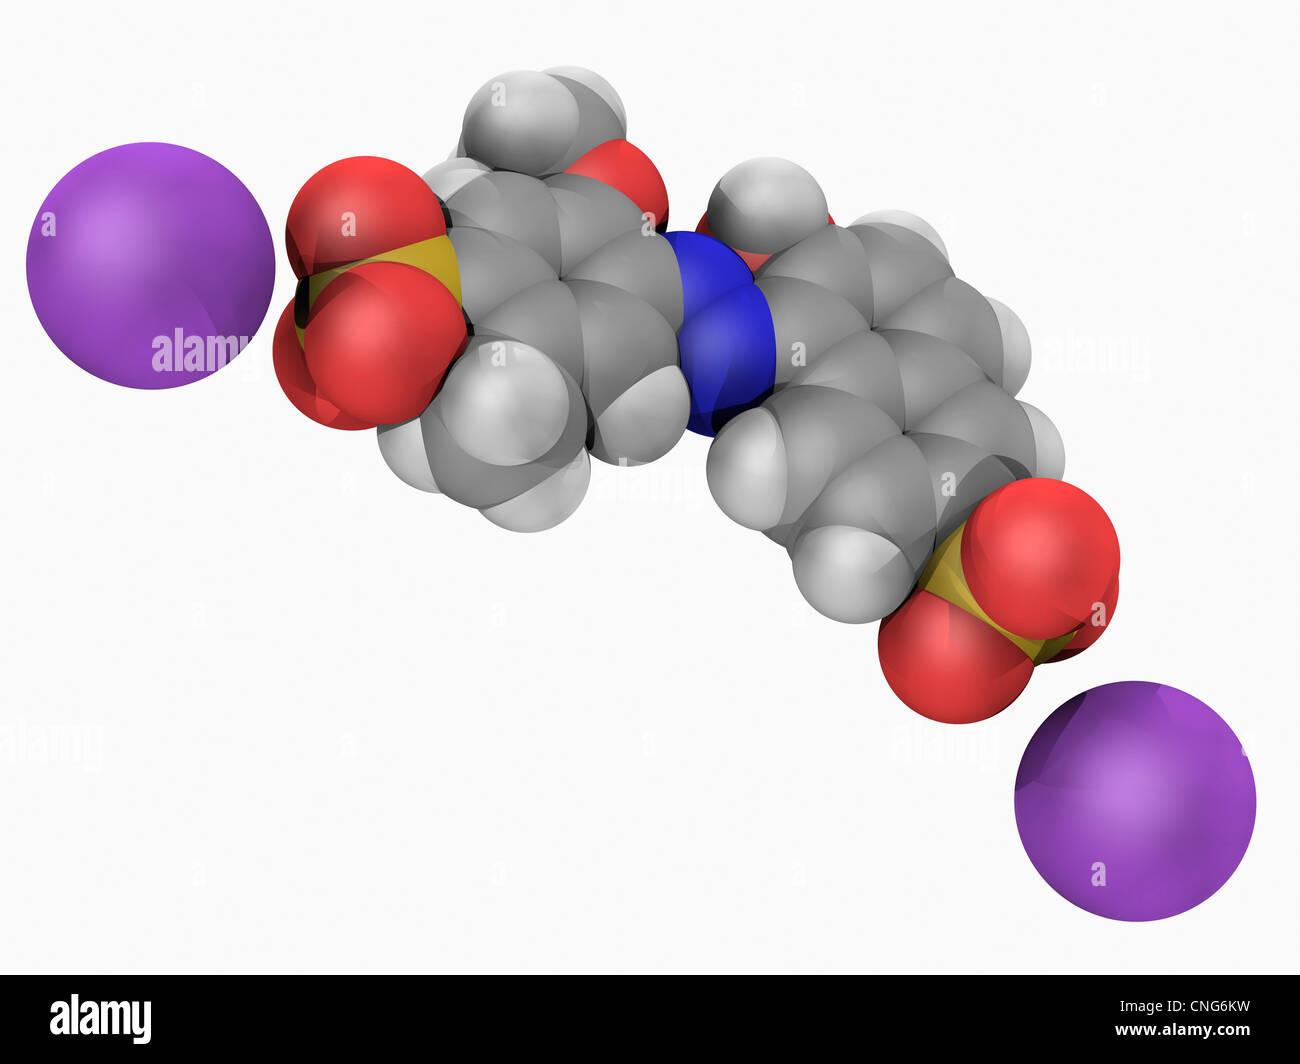 Allura Red AC Molekül Stockbild